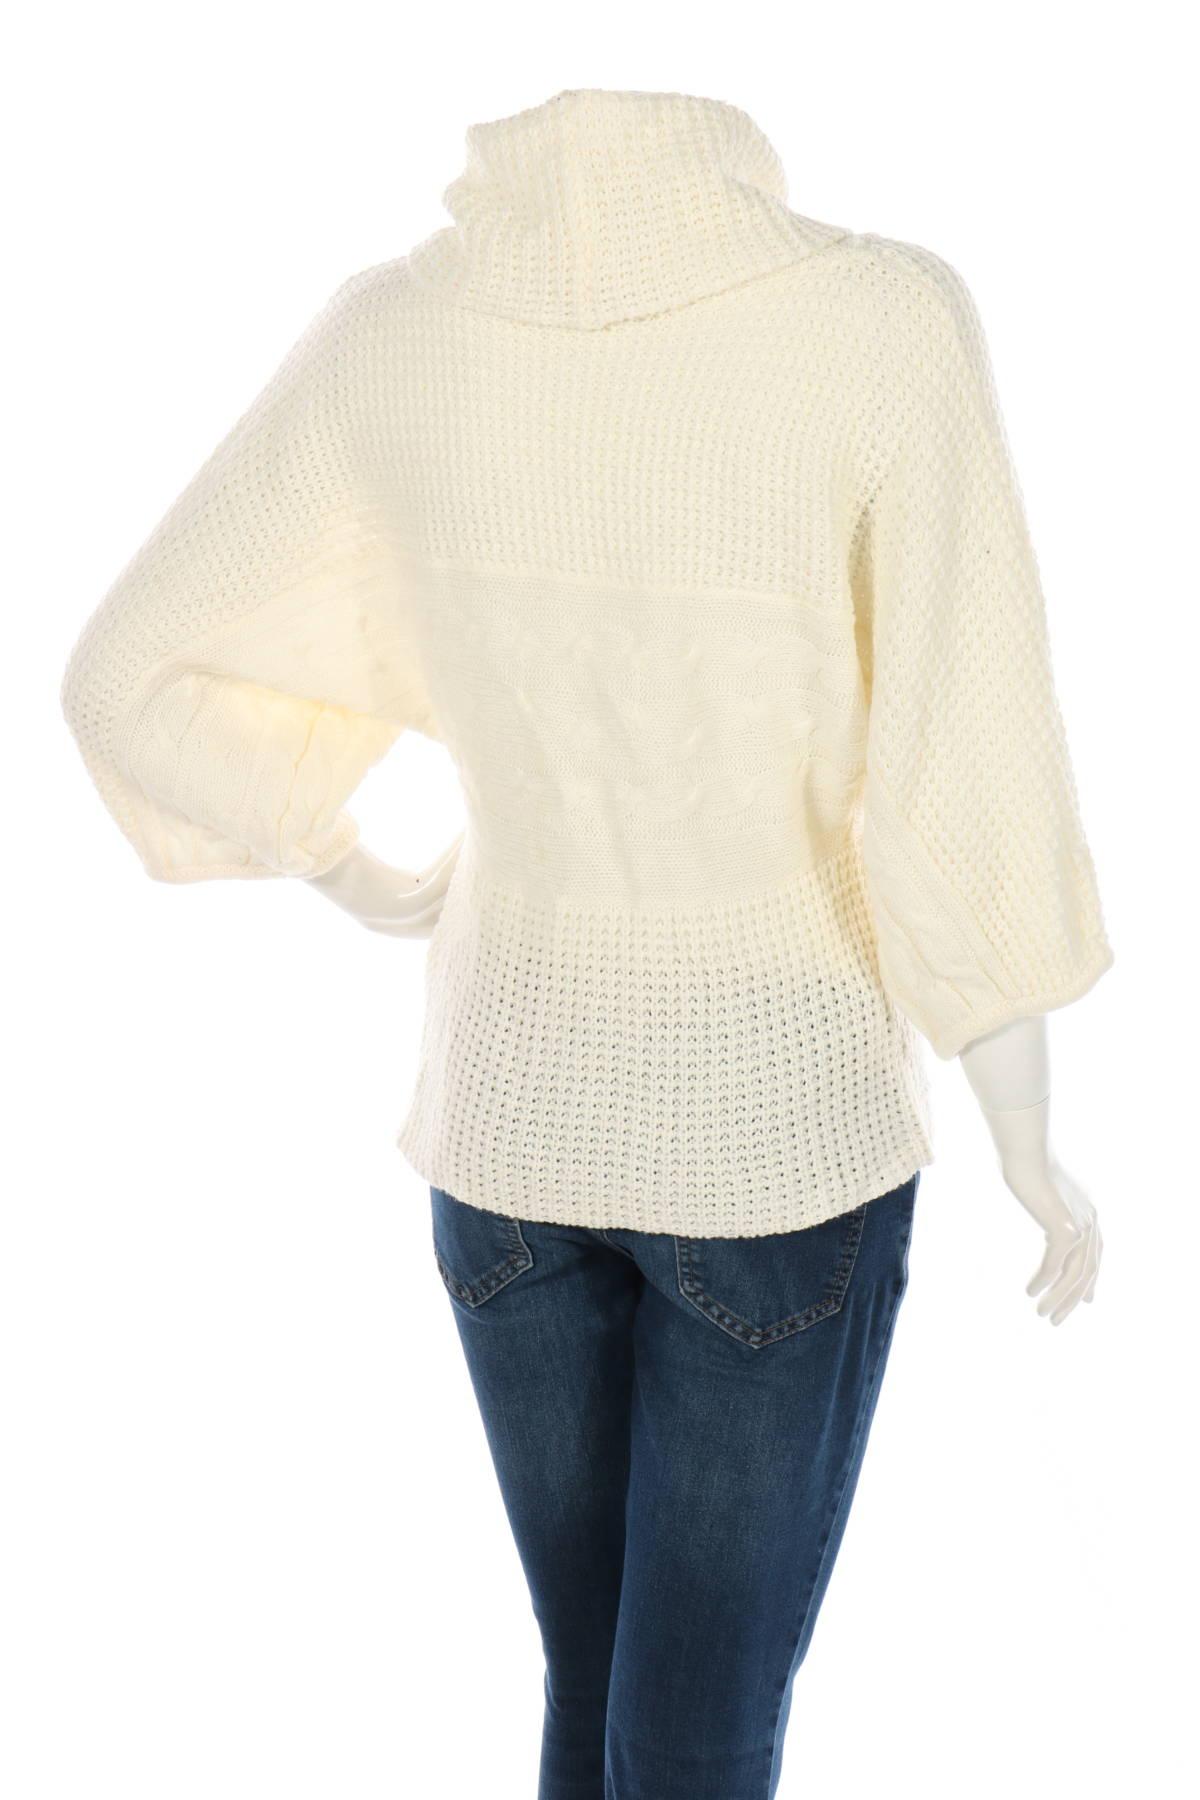 Пуловер с поло яка LOVE CHESLEY2